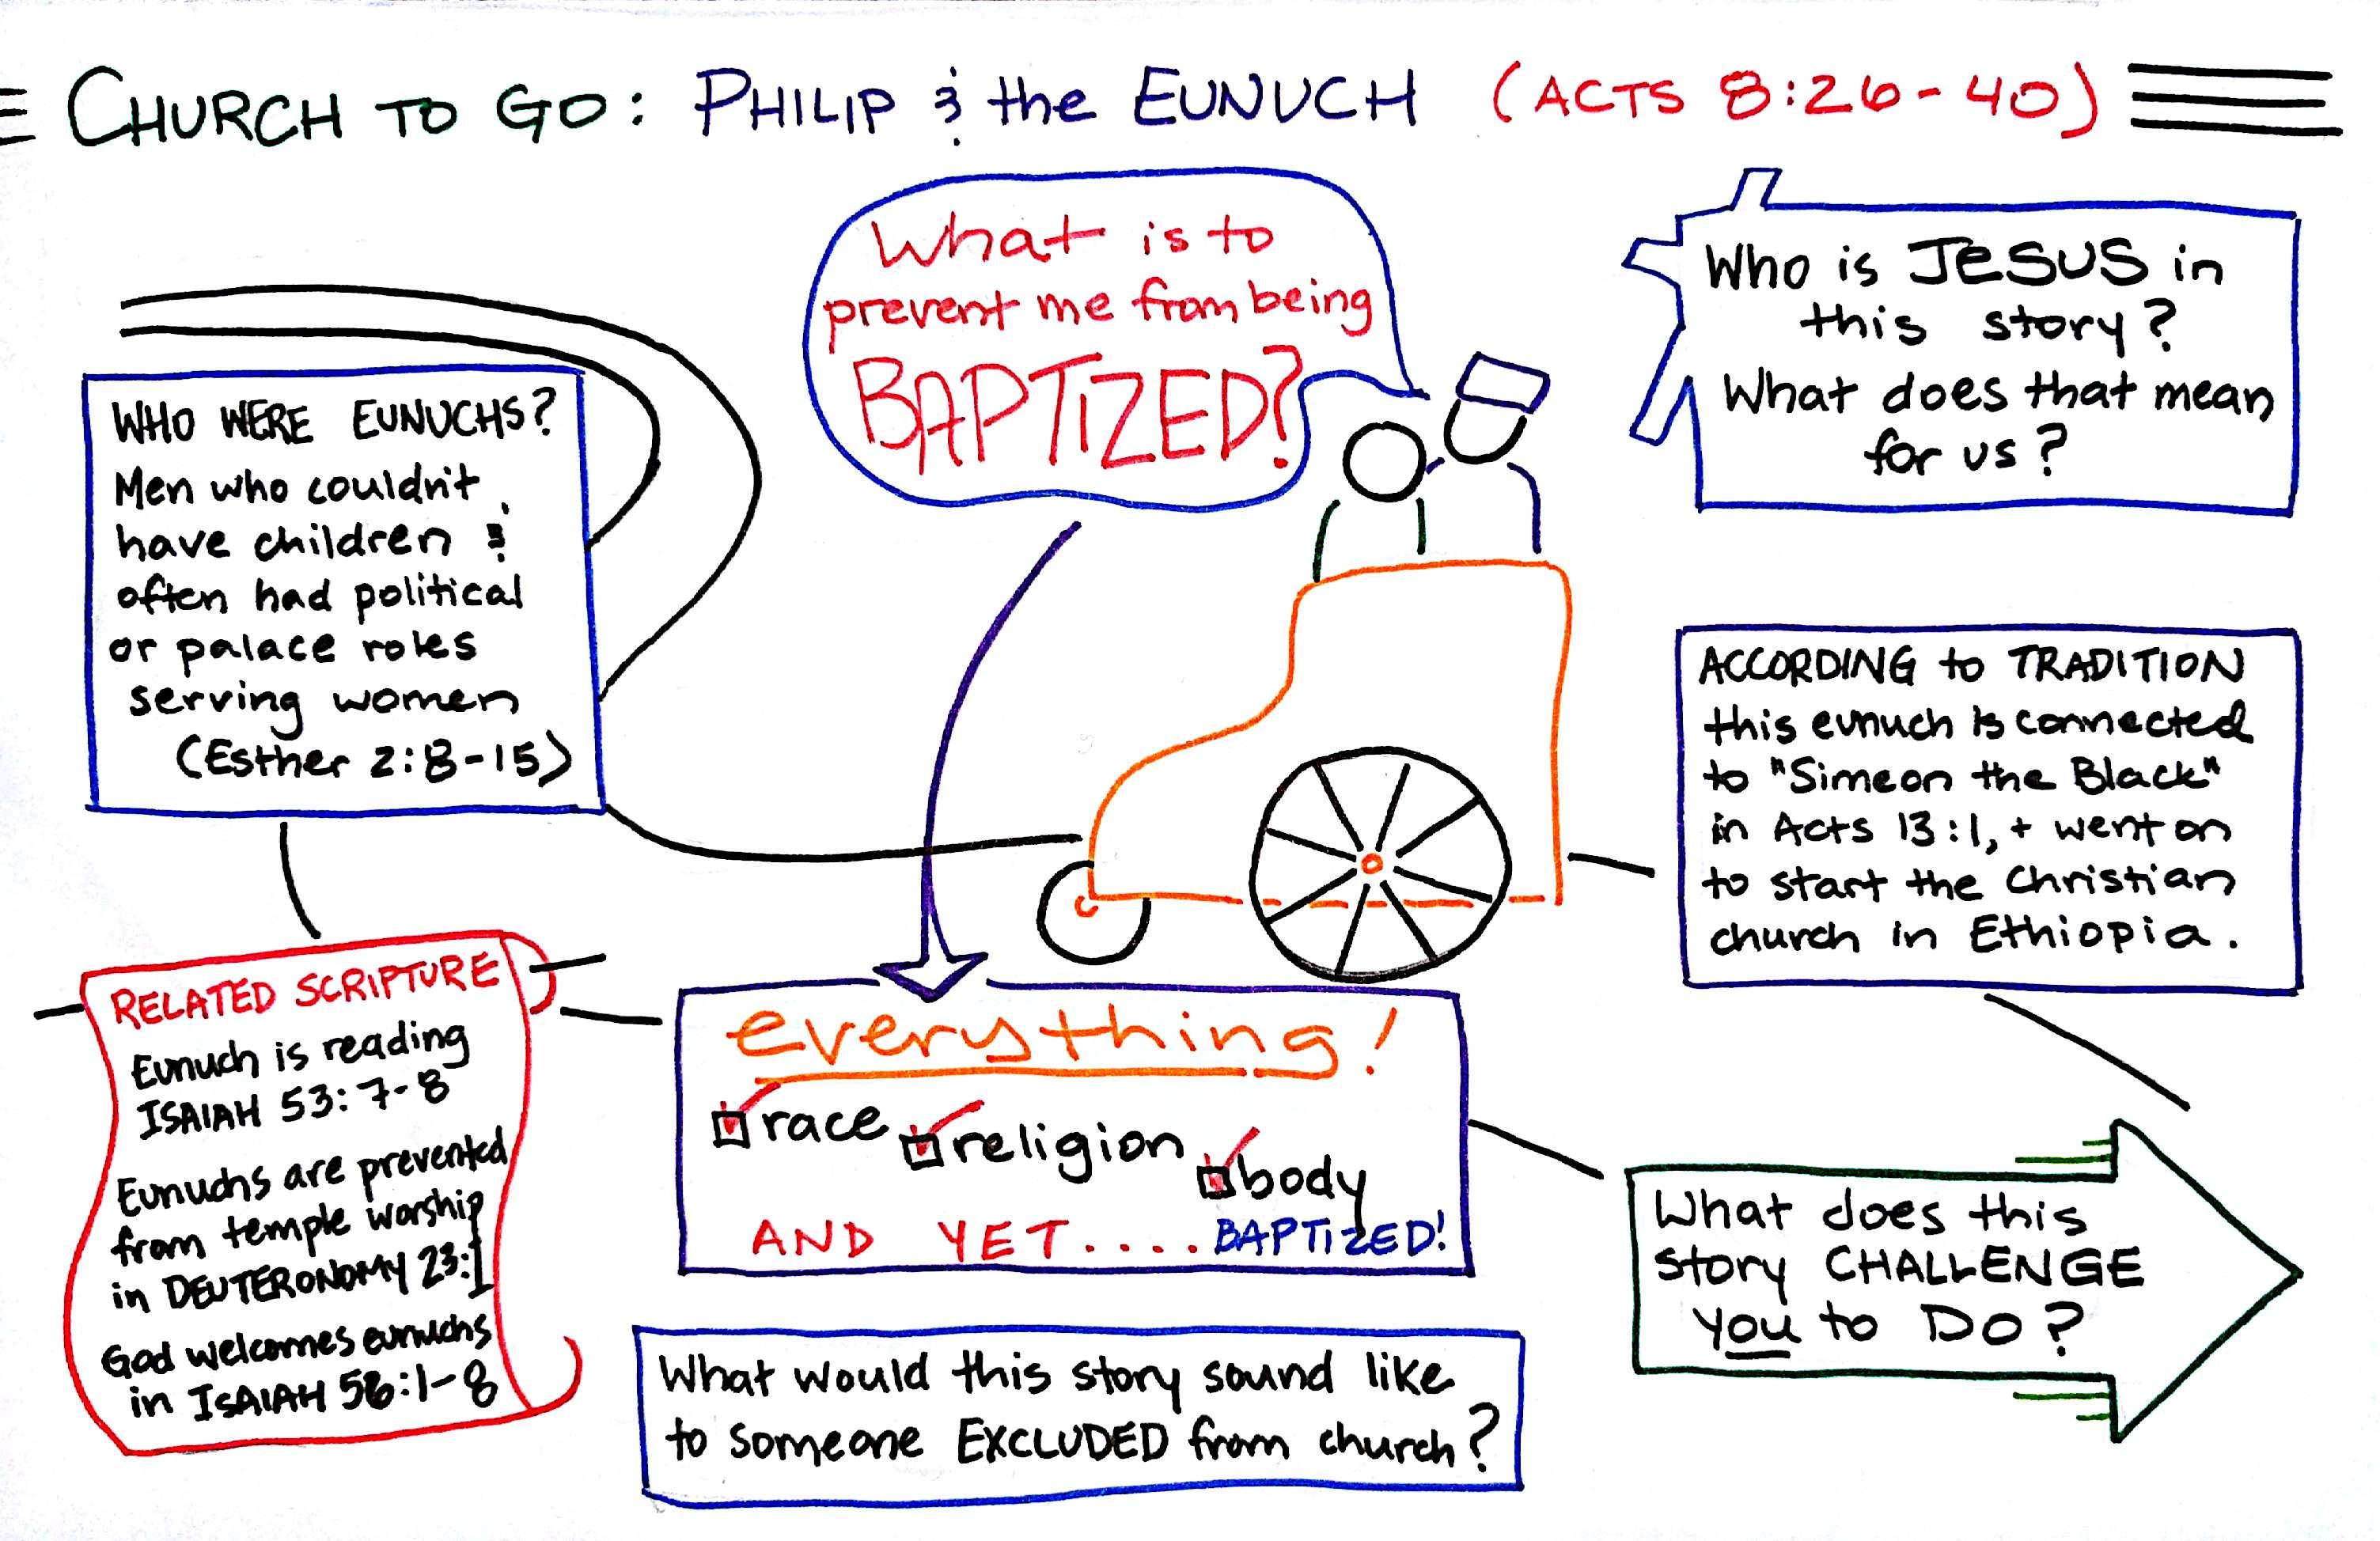 ChurchToGo Acts 826-40